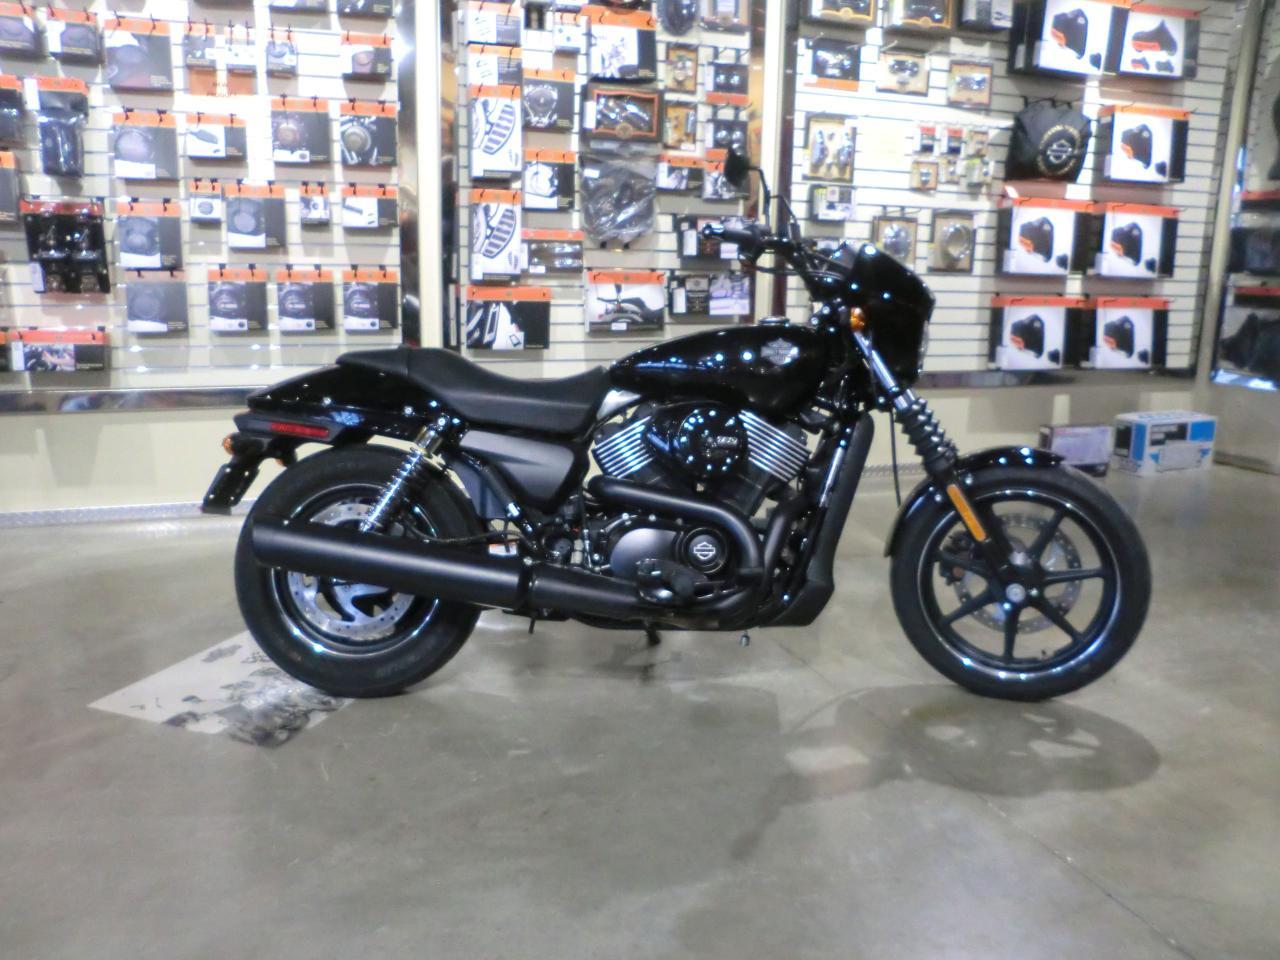 2016 Harley-Davidson Street 750 STREET XG750